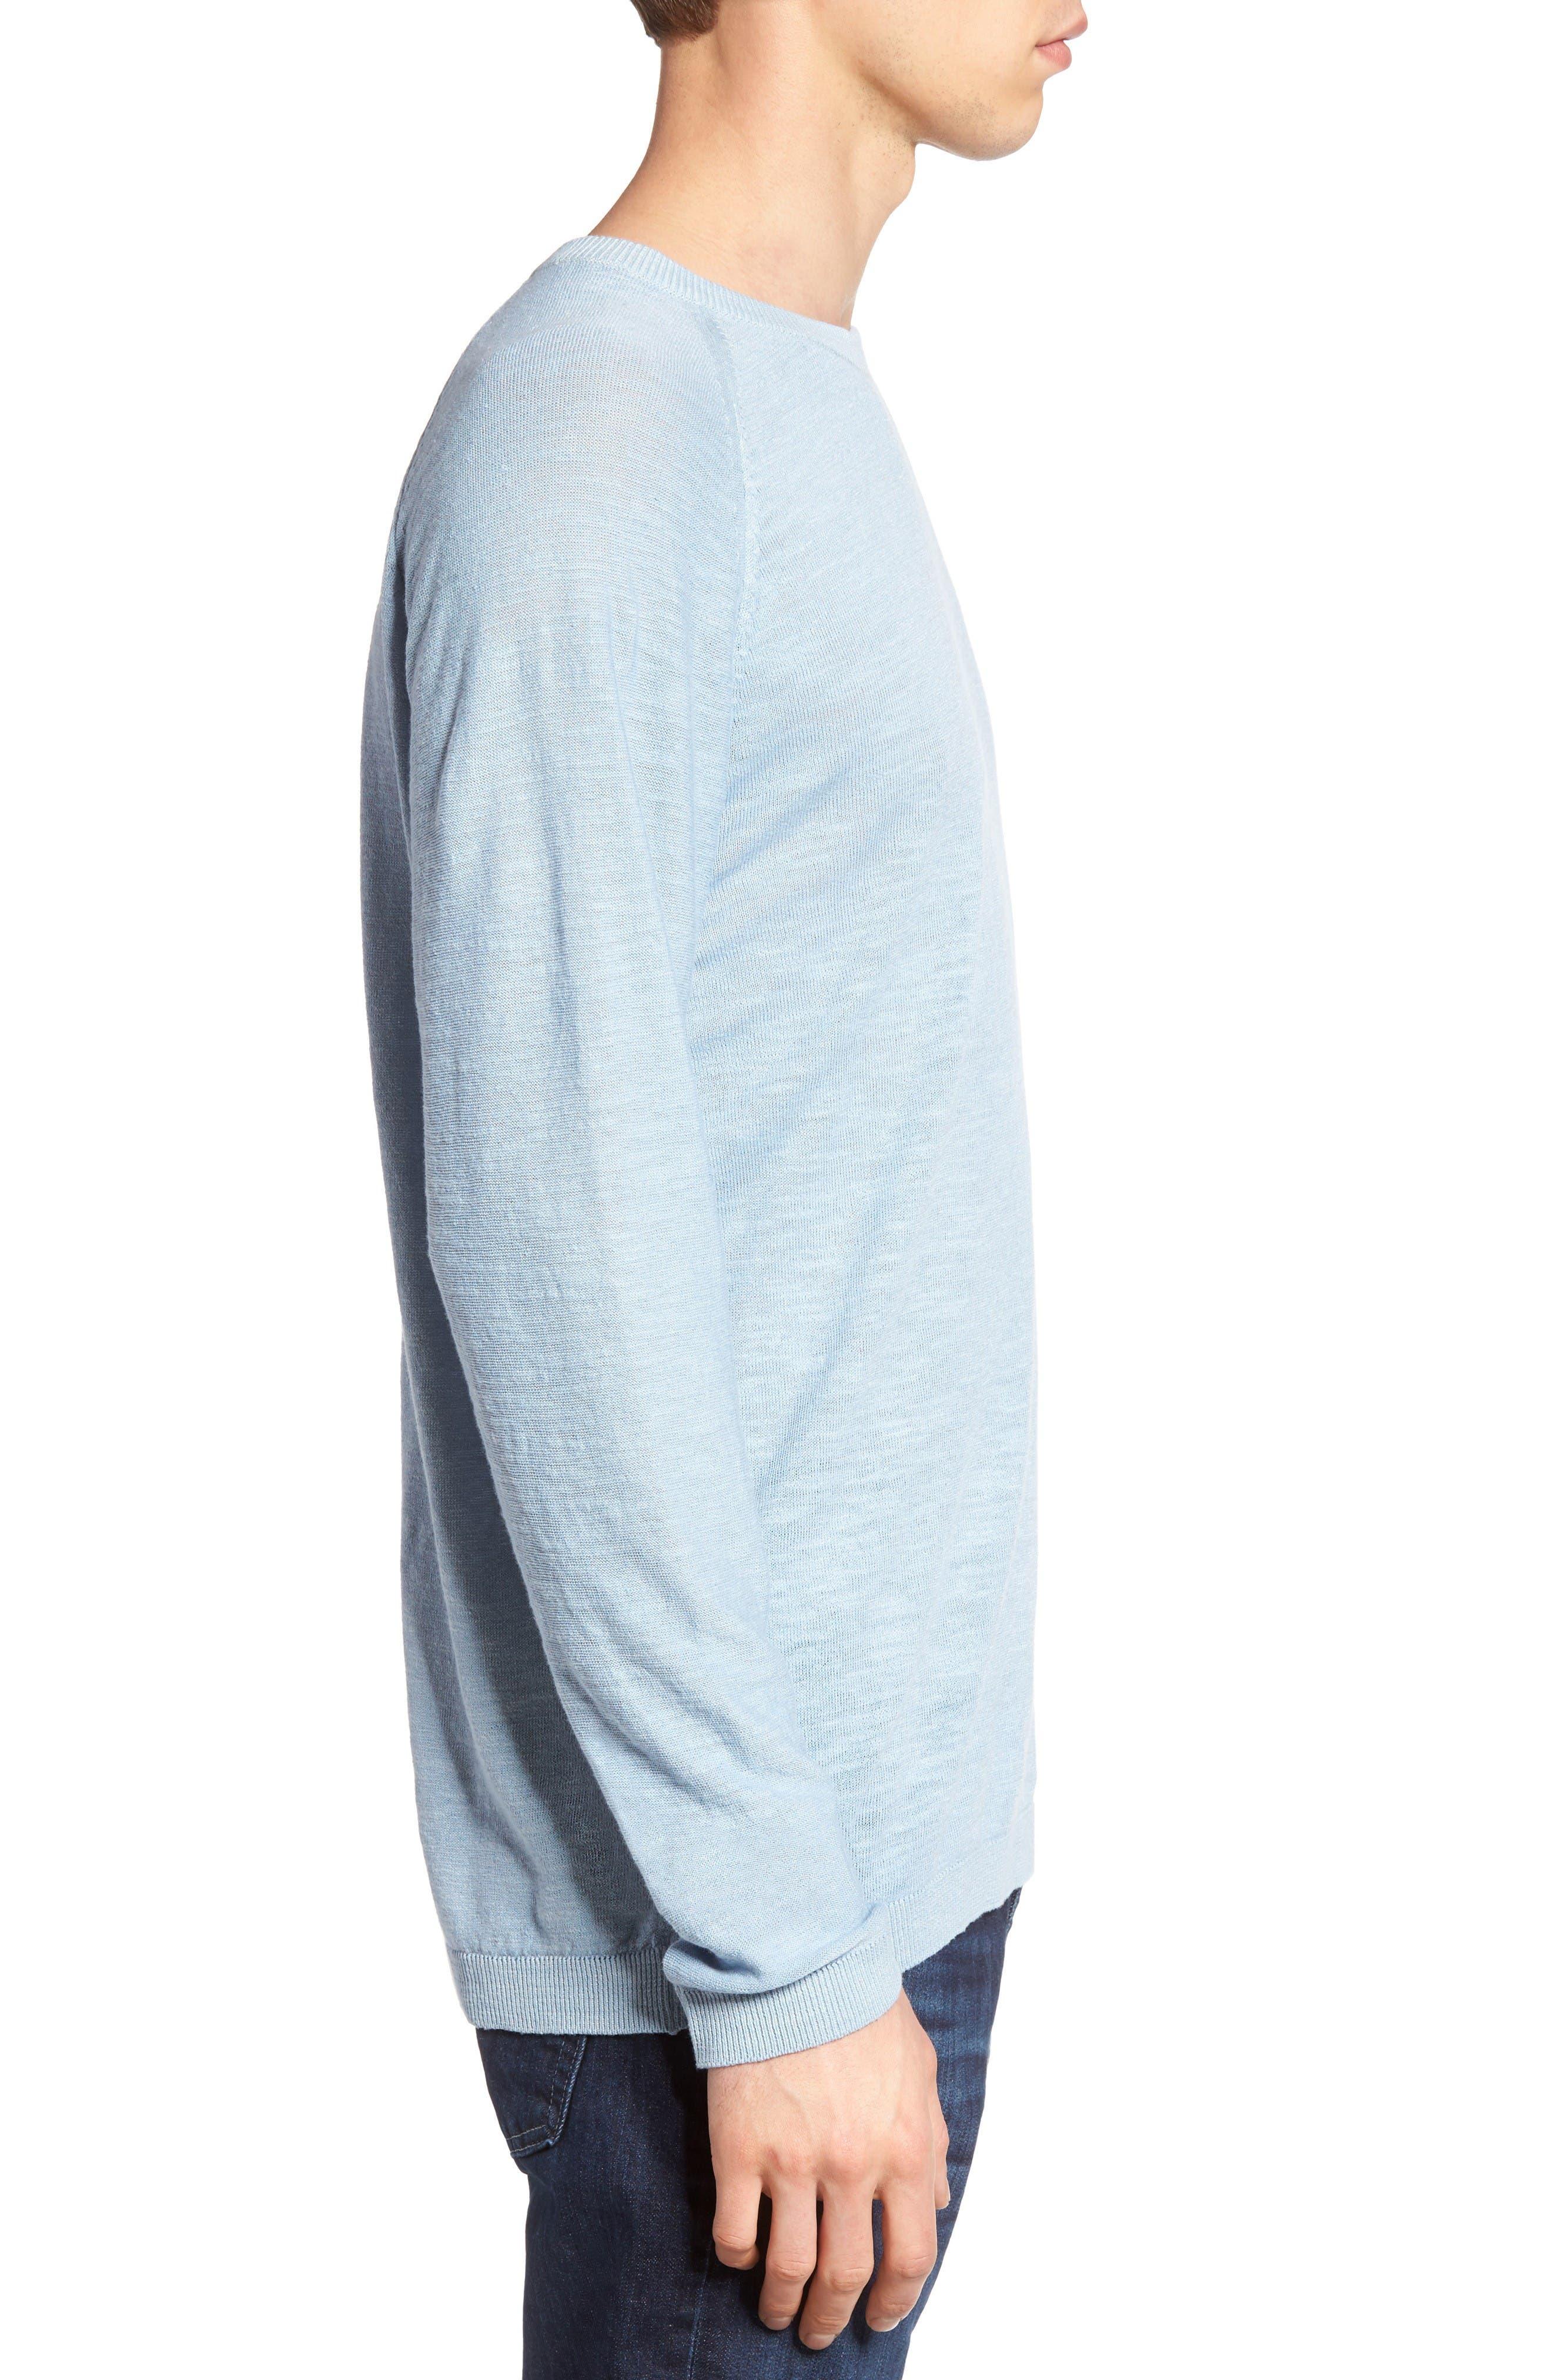 Arambol Cotton & Linen Sweater,                             Alternate thumbnail 3, color,                             Blue Lagoon